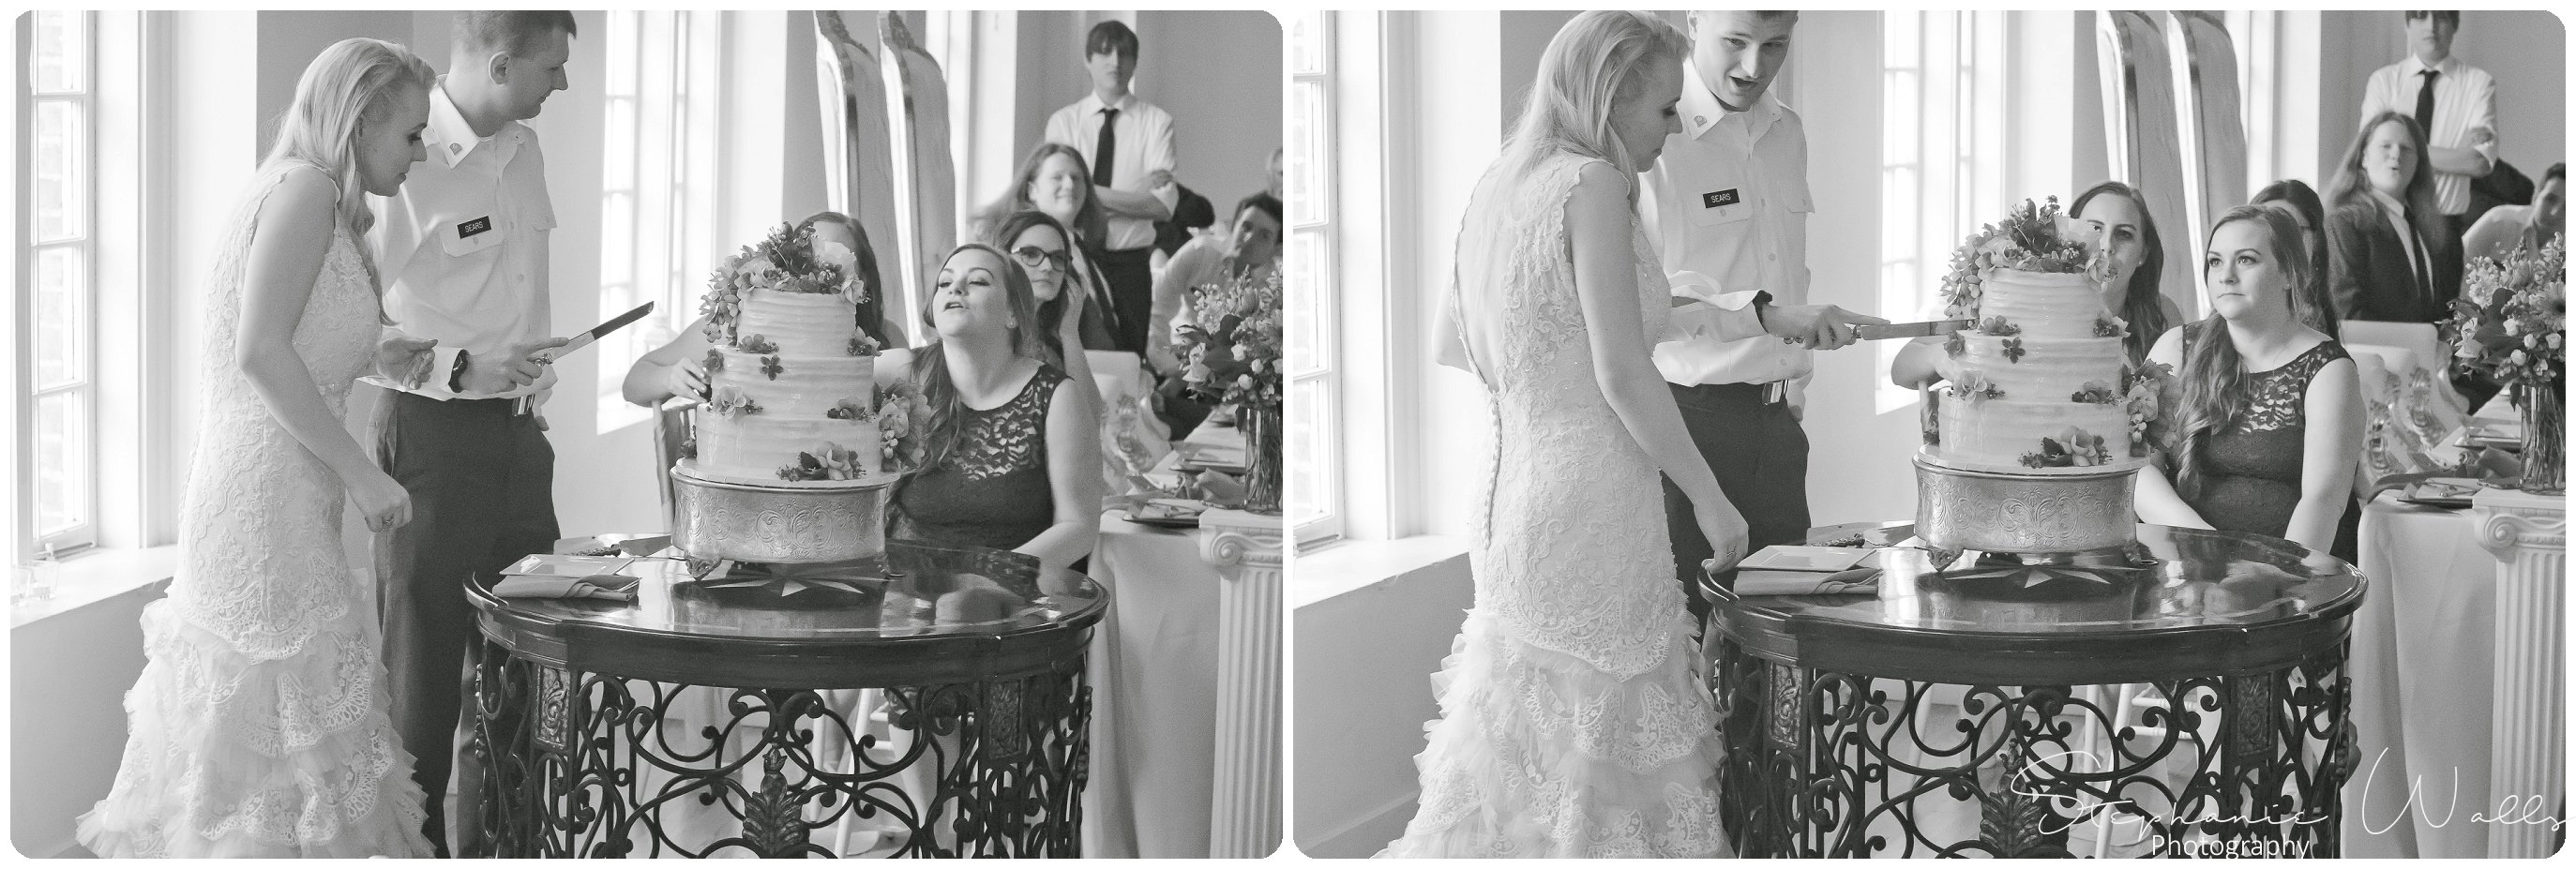 Sears Dinner Toast Cake 138 The Hero & The Starlet | Monte Cristo Ballroom | Stephanie Walls Photography Weddings